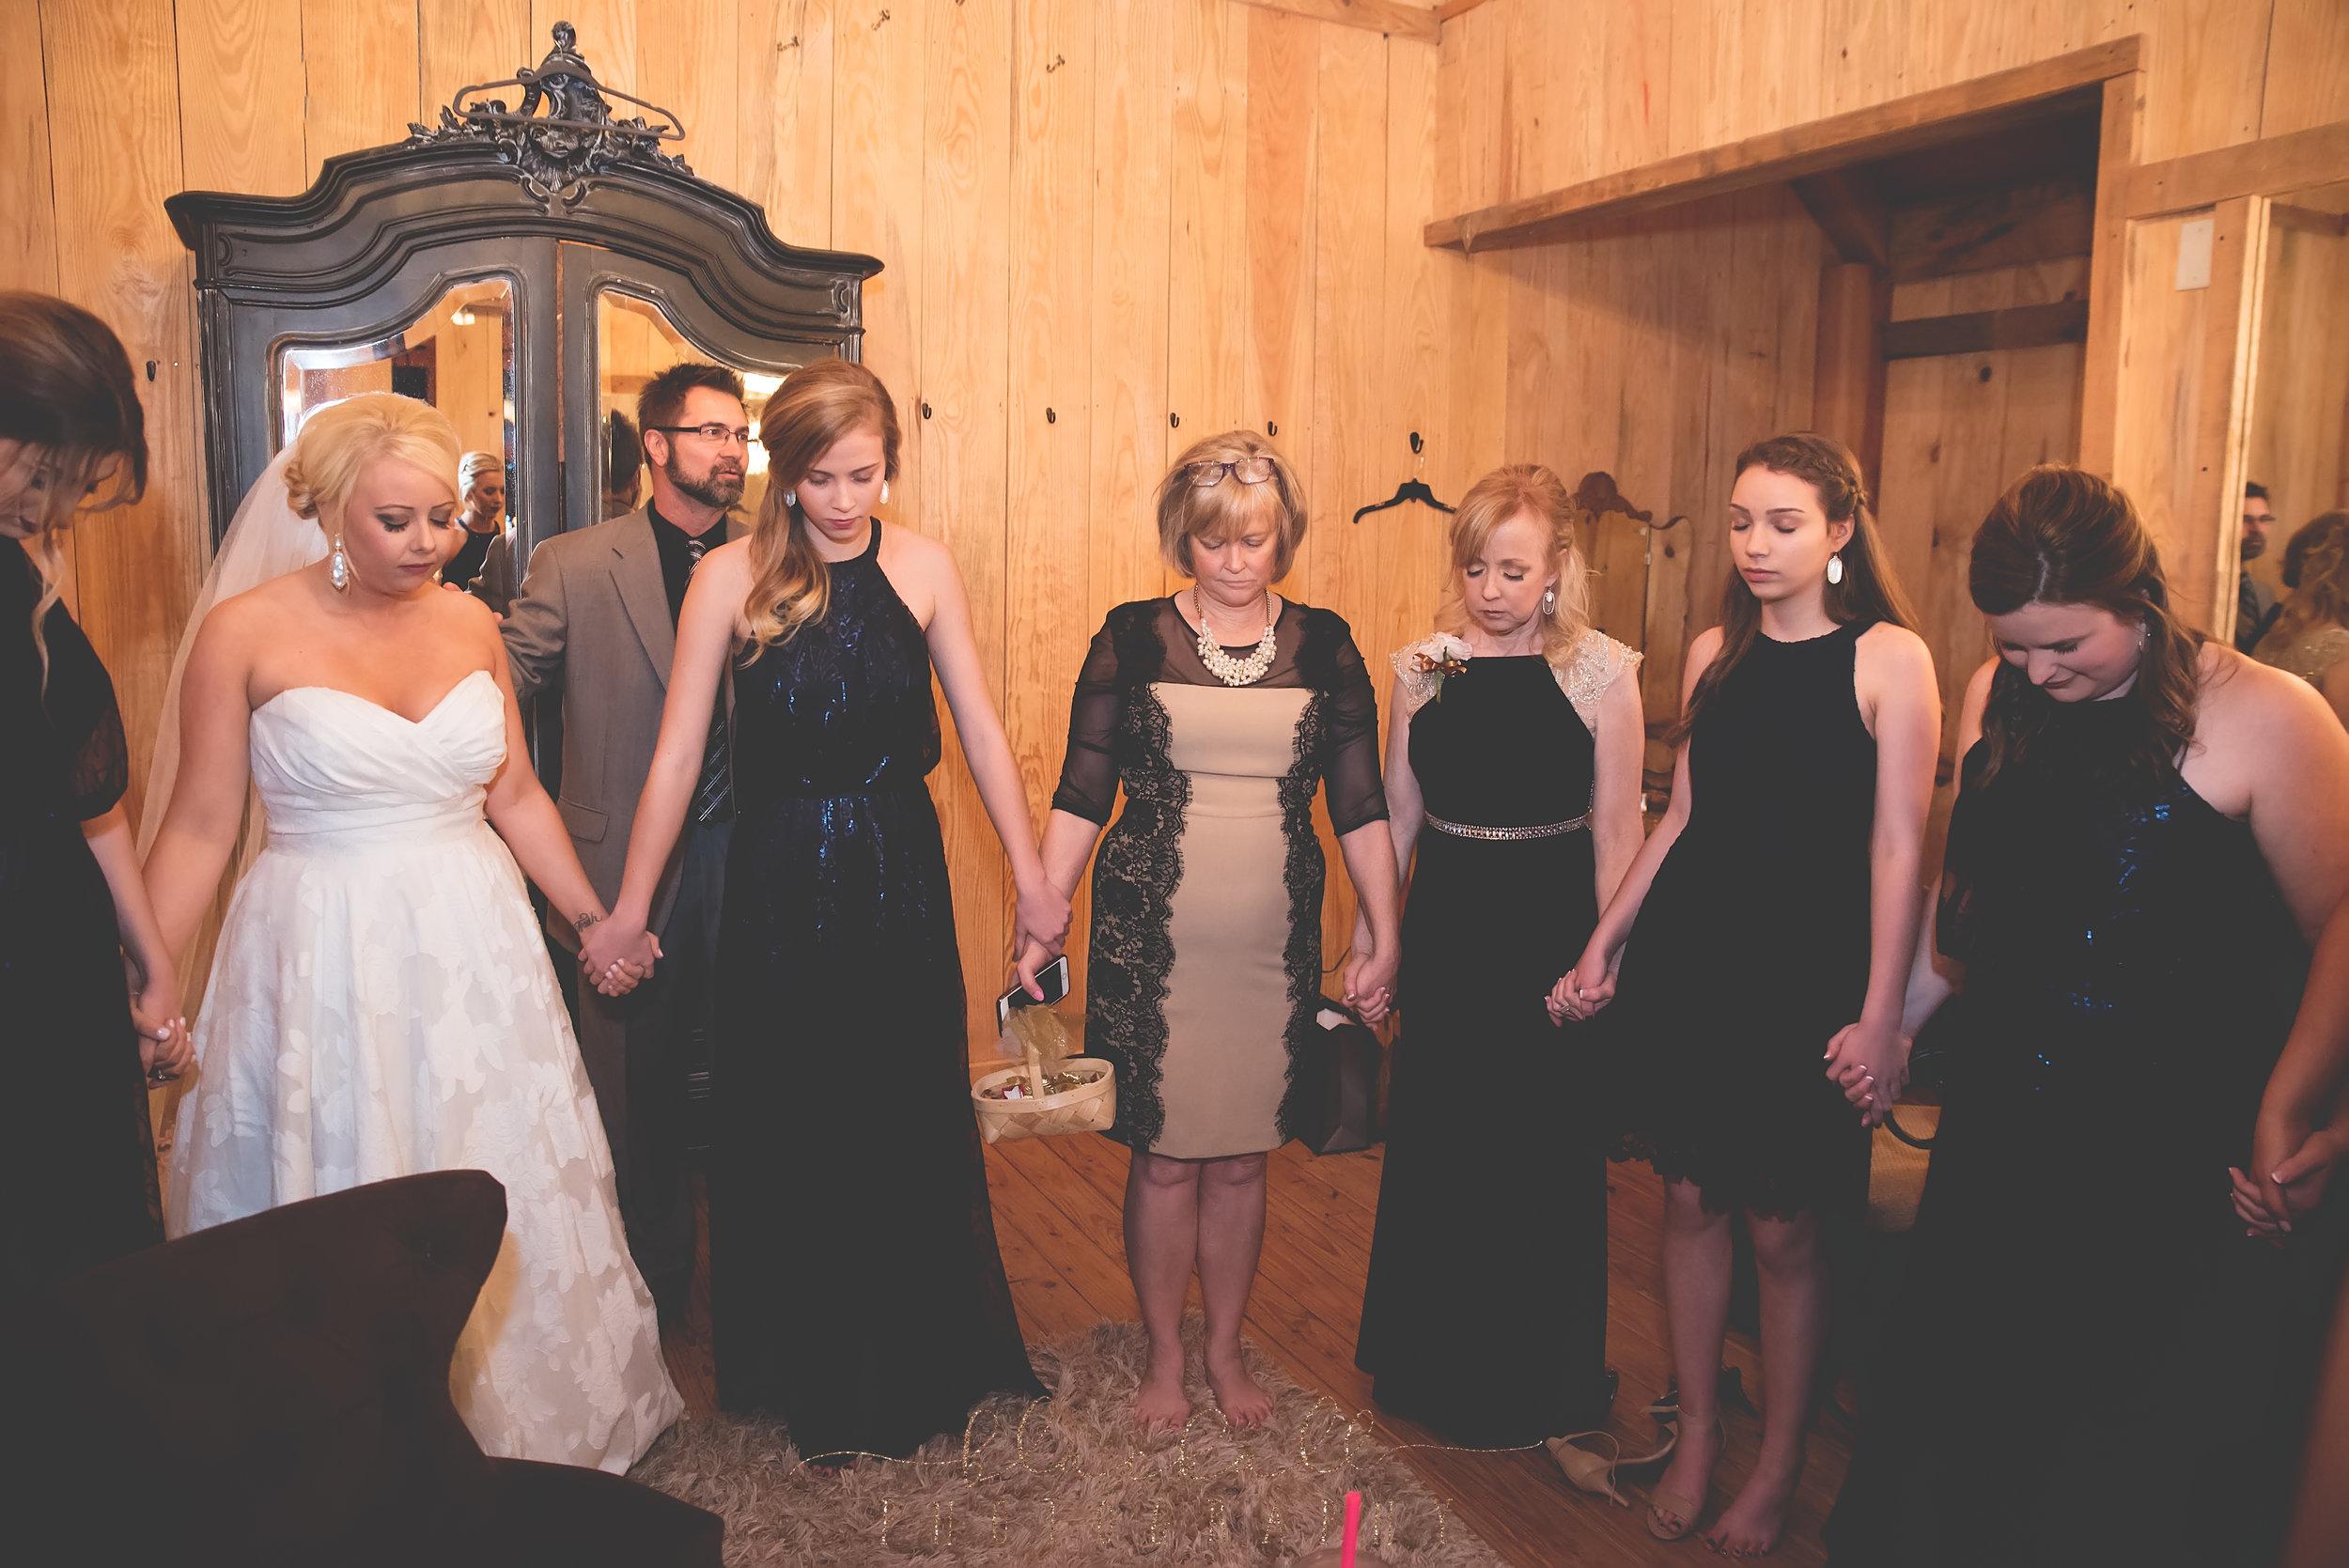 M&M WEDDING_Blackall Photography-30.JPG